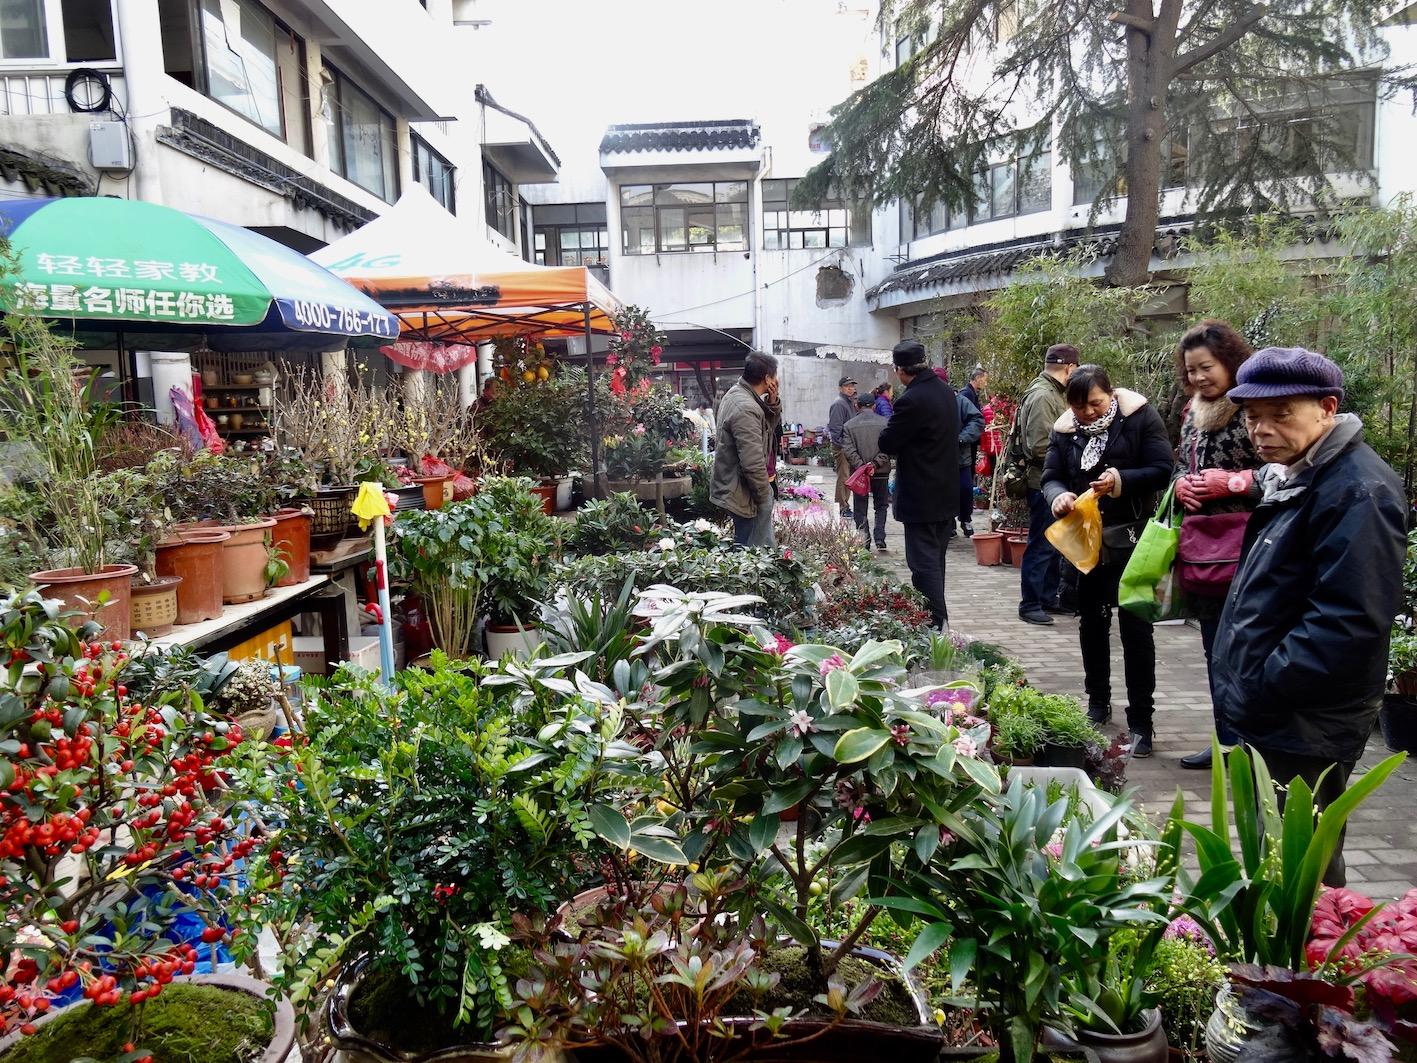 Pishi Street Plant Market Suzhou Jiangsu Province China